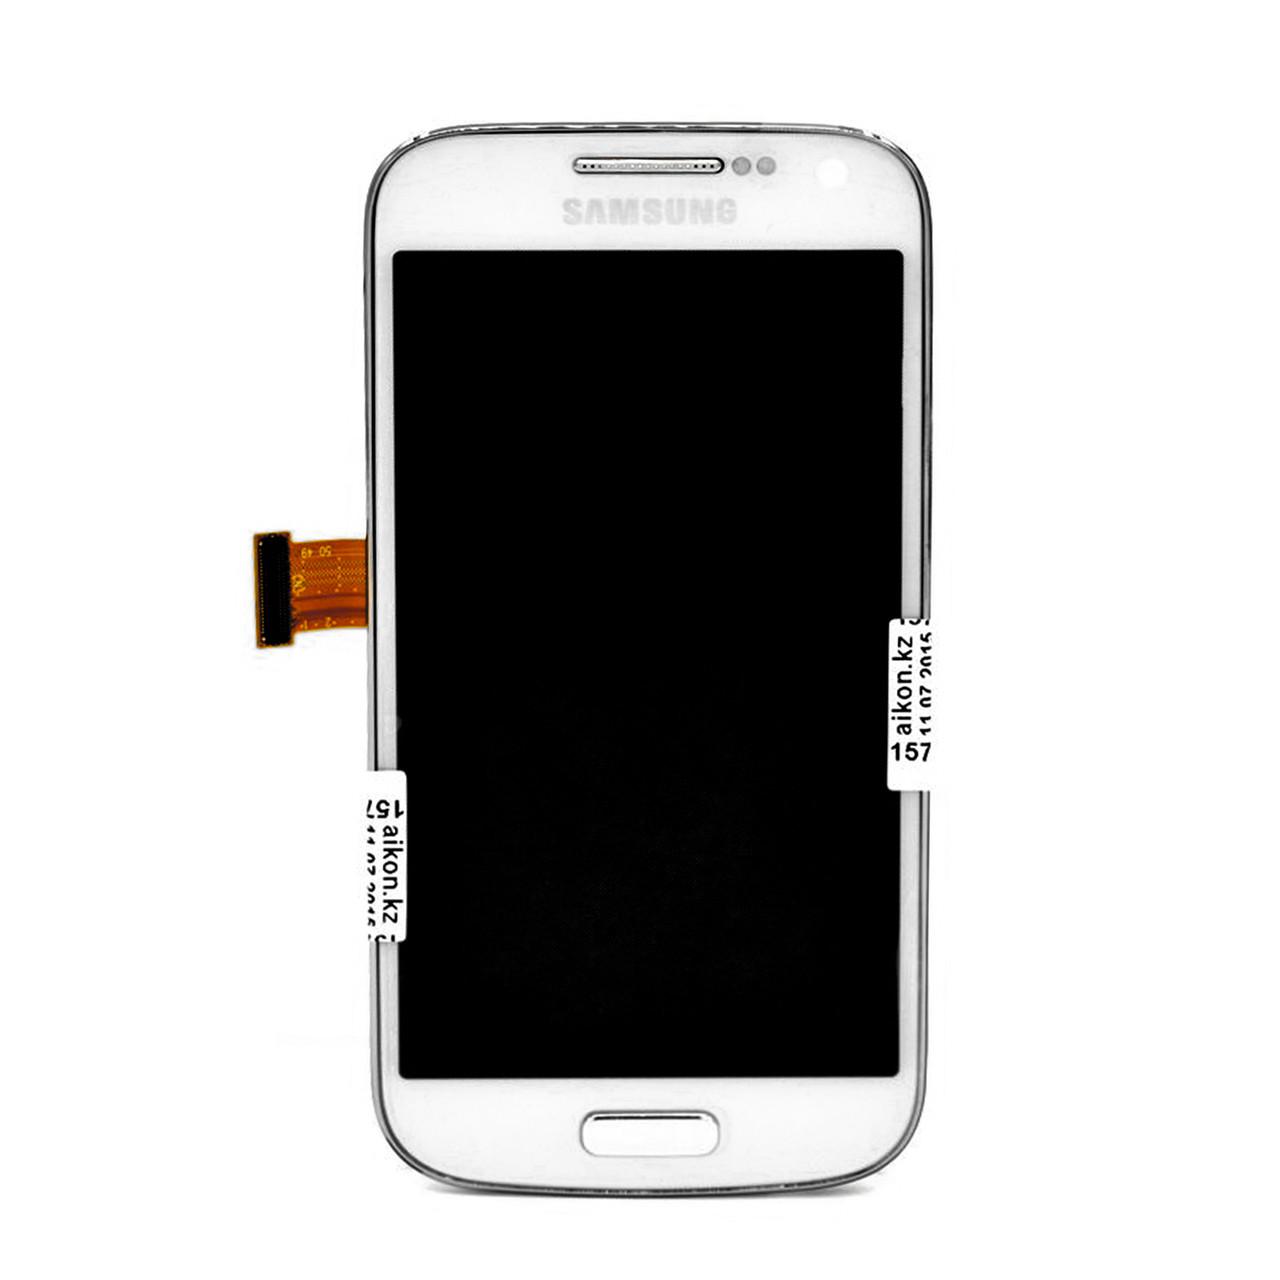 Дисплей Samsung Galaxy S4 mini i9190 в сборе White (22)